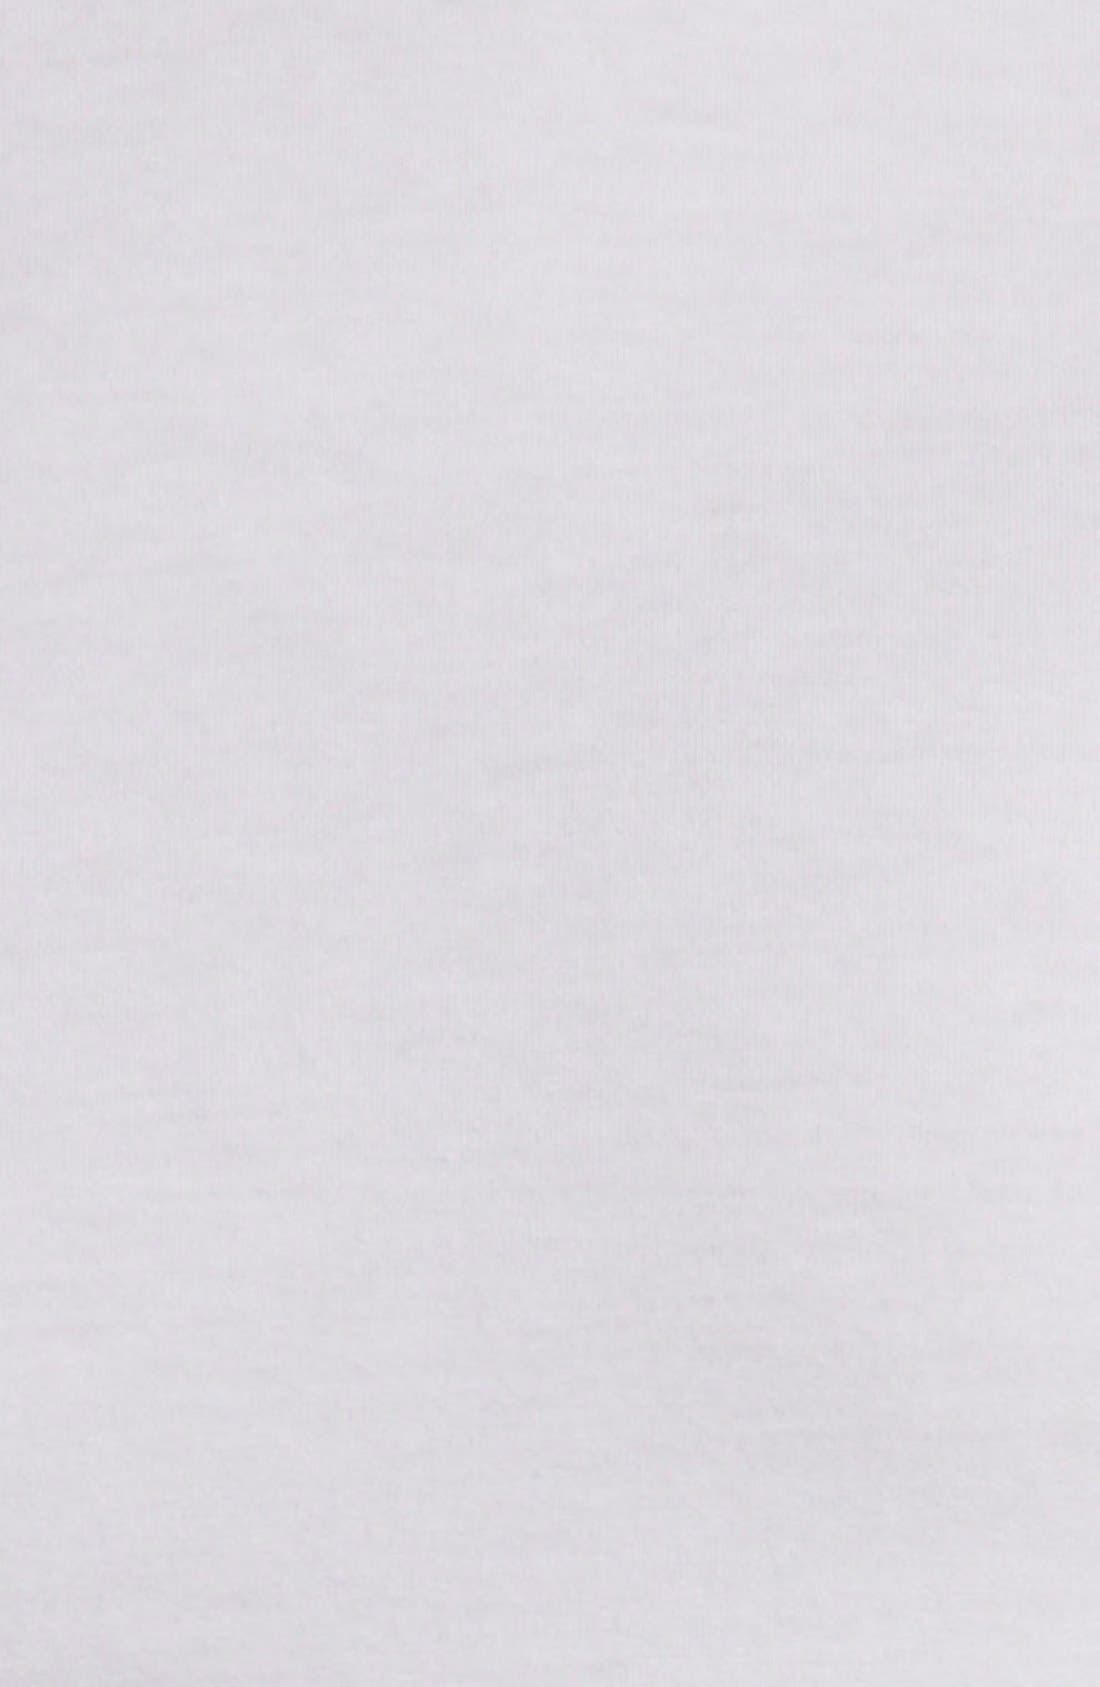 TOMMY JOHN,                             Cool Cotton Crewneck Undershirt,                             Alternate thumbnail 2, color,                             WHITE